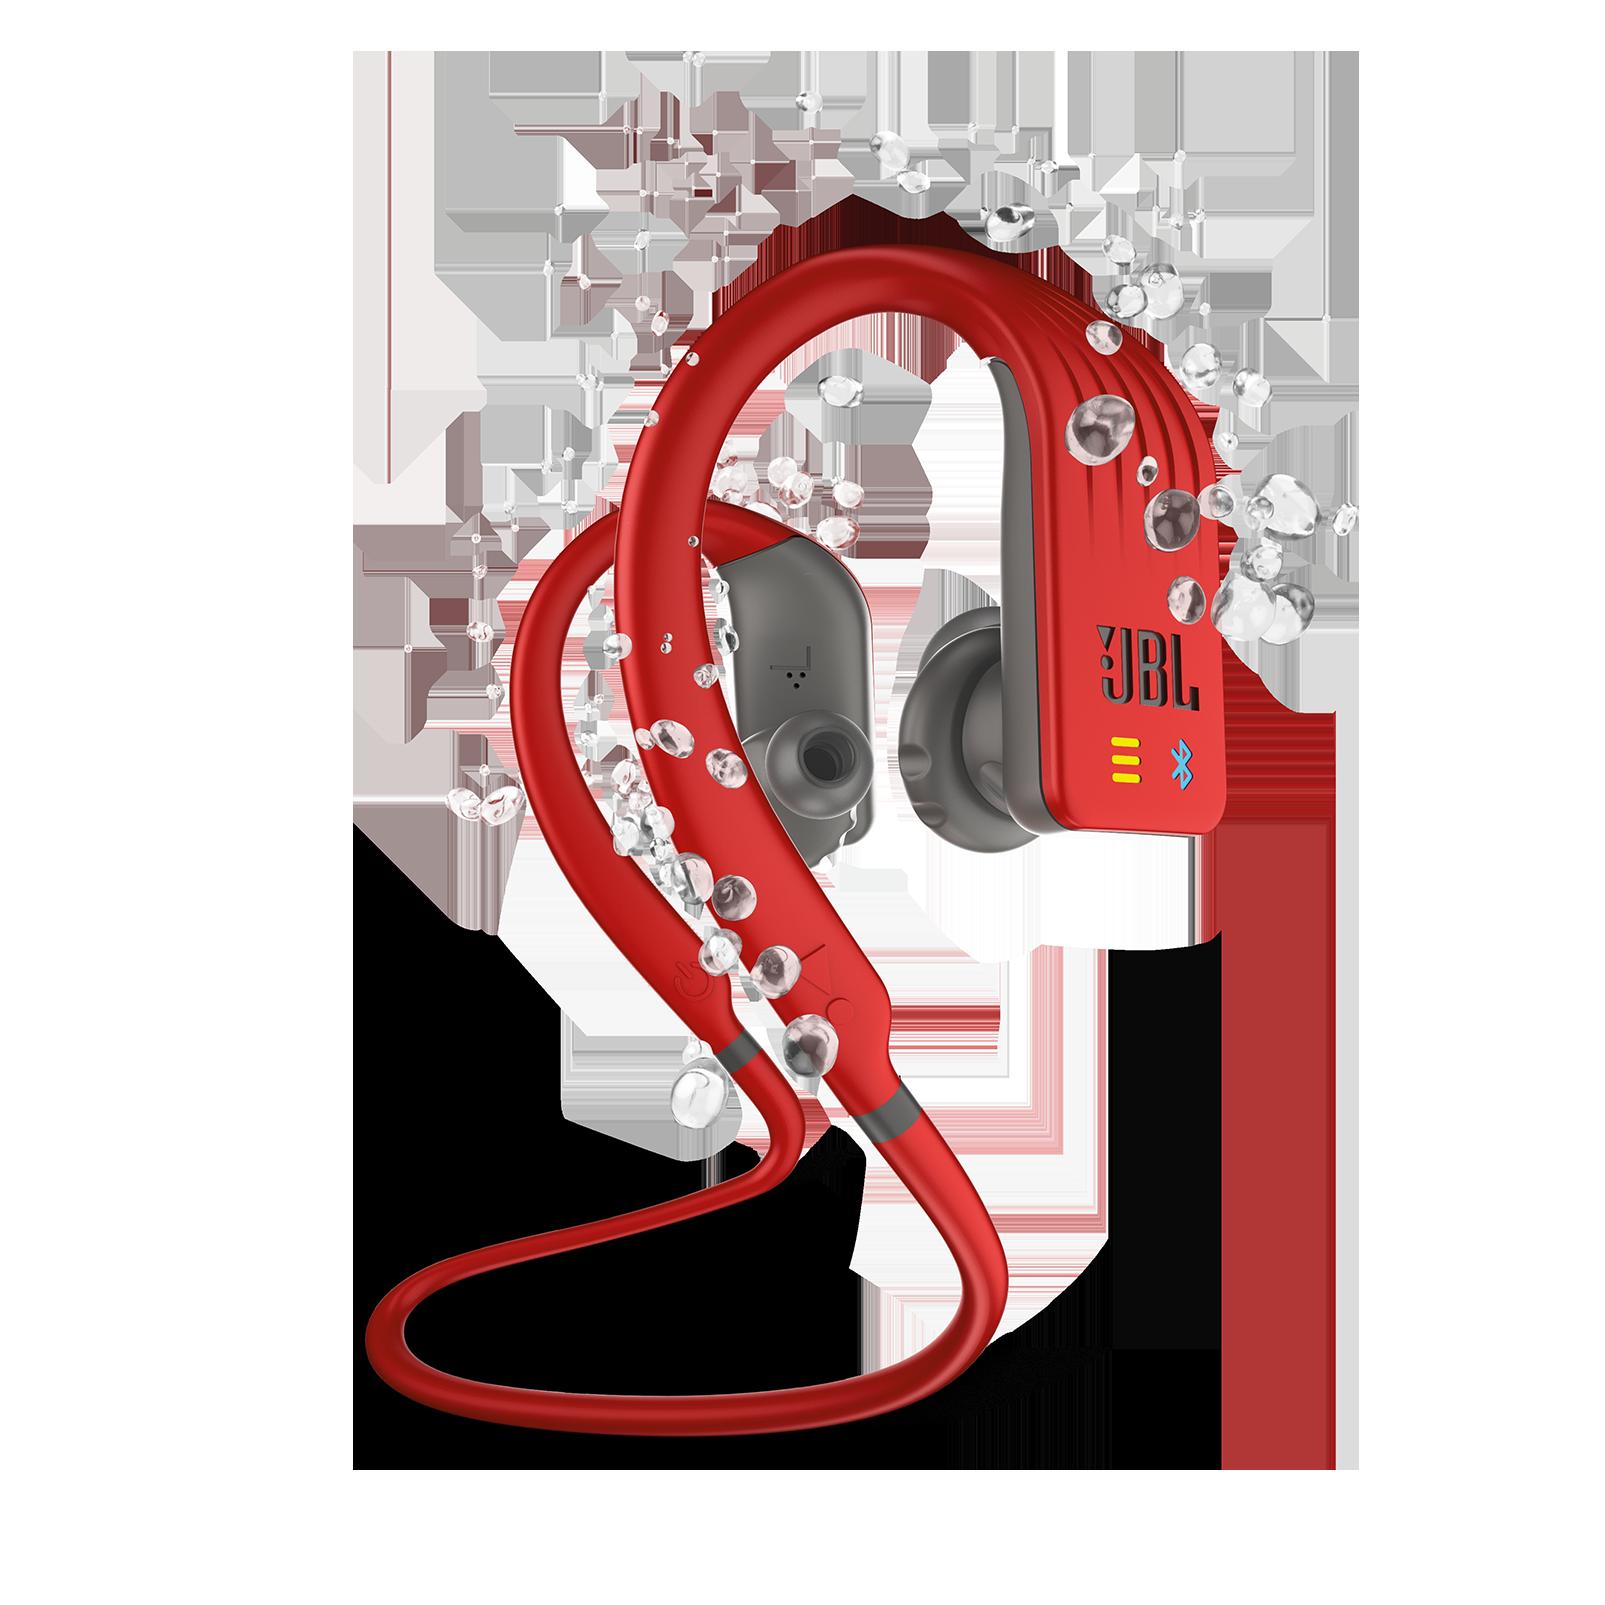 JBL Endurance DIVE - Red - Waterproof Wireless In-Ear Sport Headphones with MP3 Player - Hero